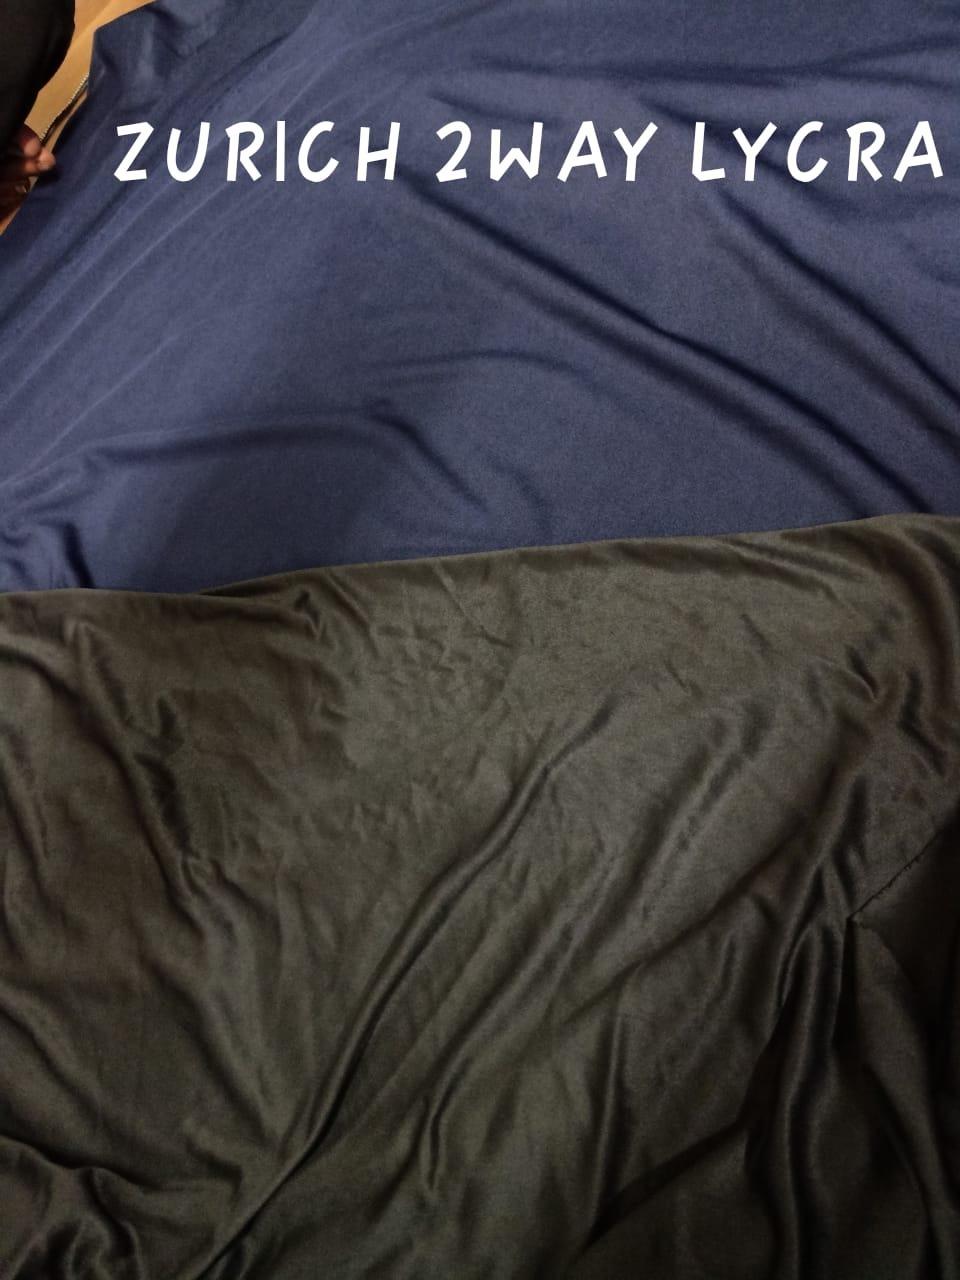 Polyester Silky Lycra ( Zurich micro - 2 way ) Fabric